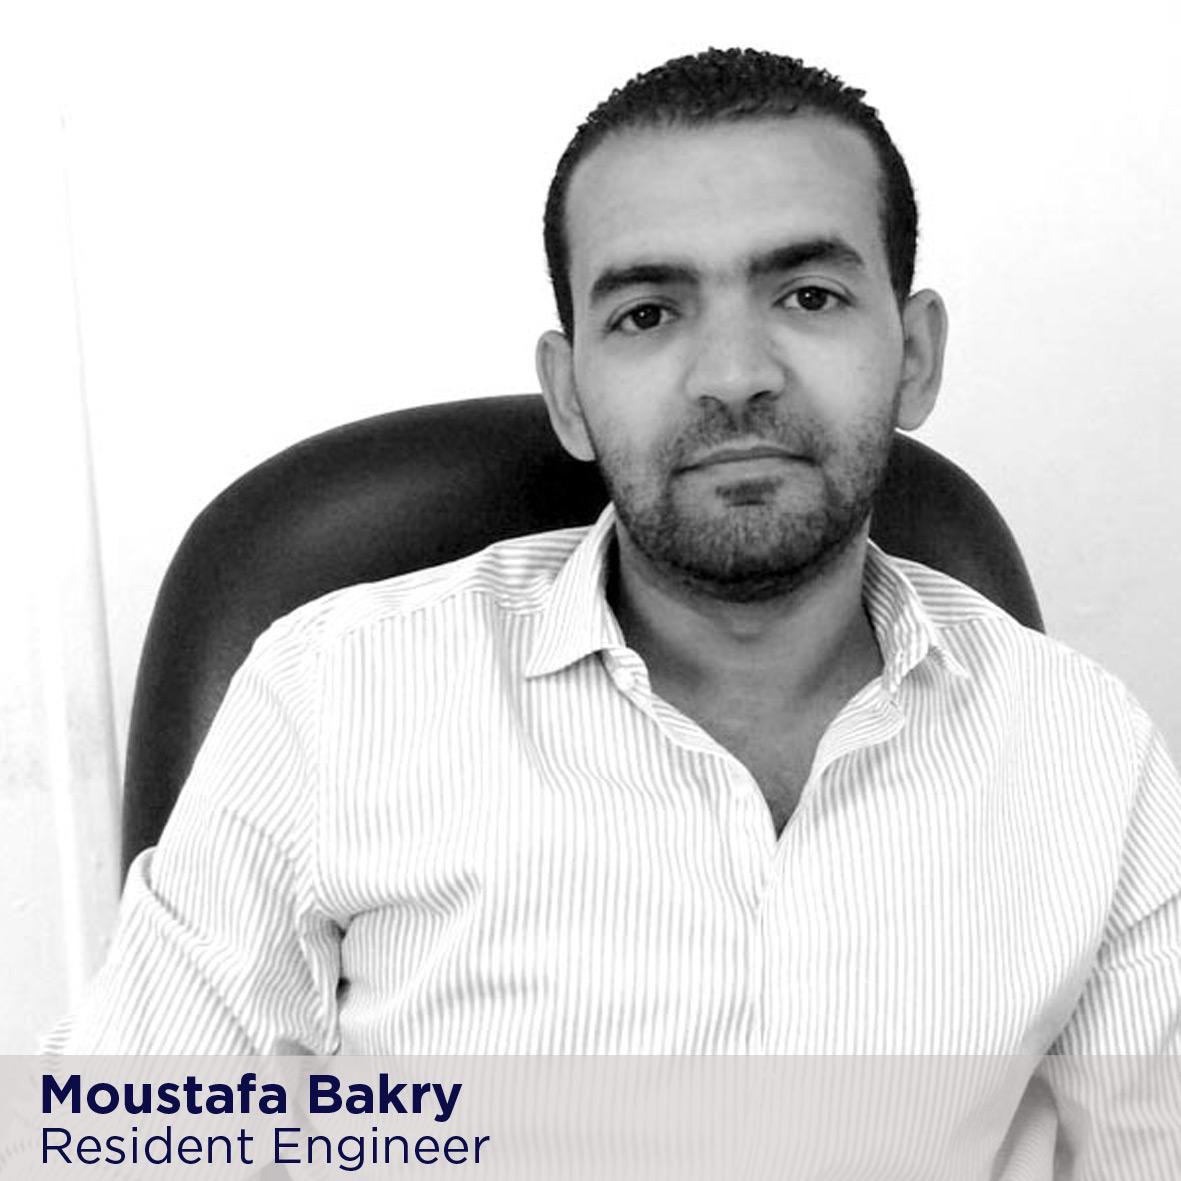 Moustafa Bakry